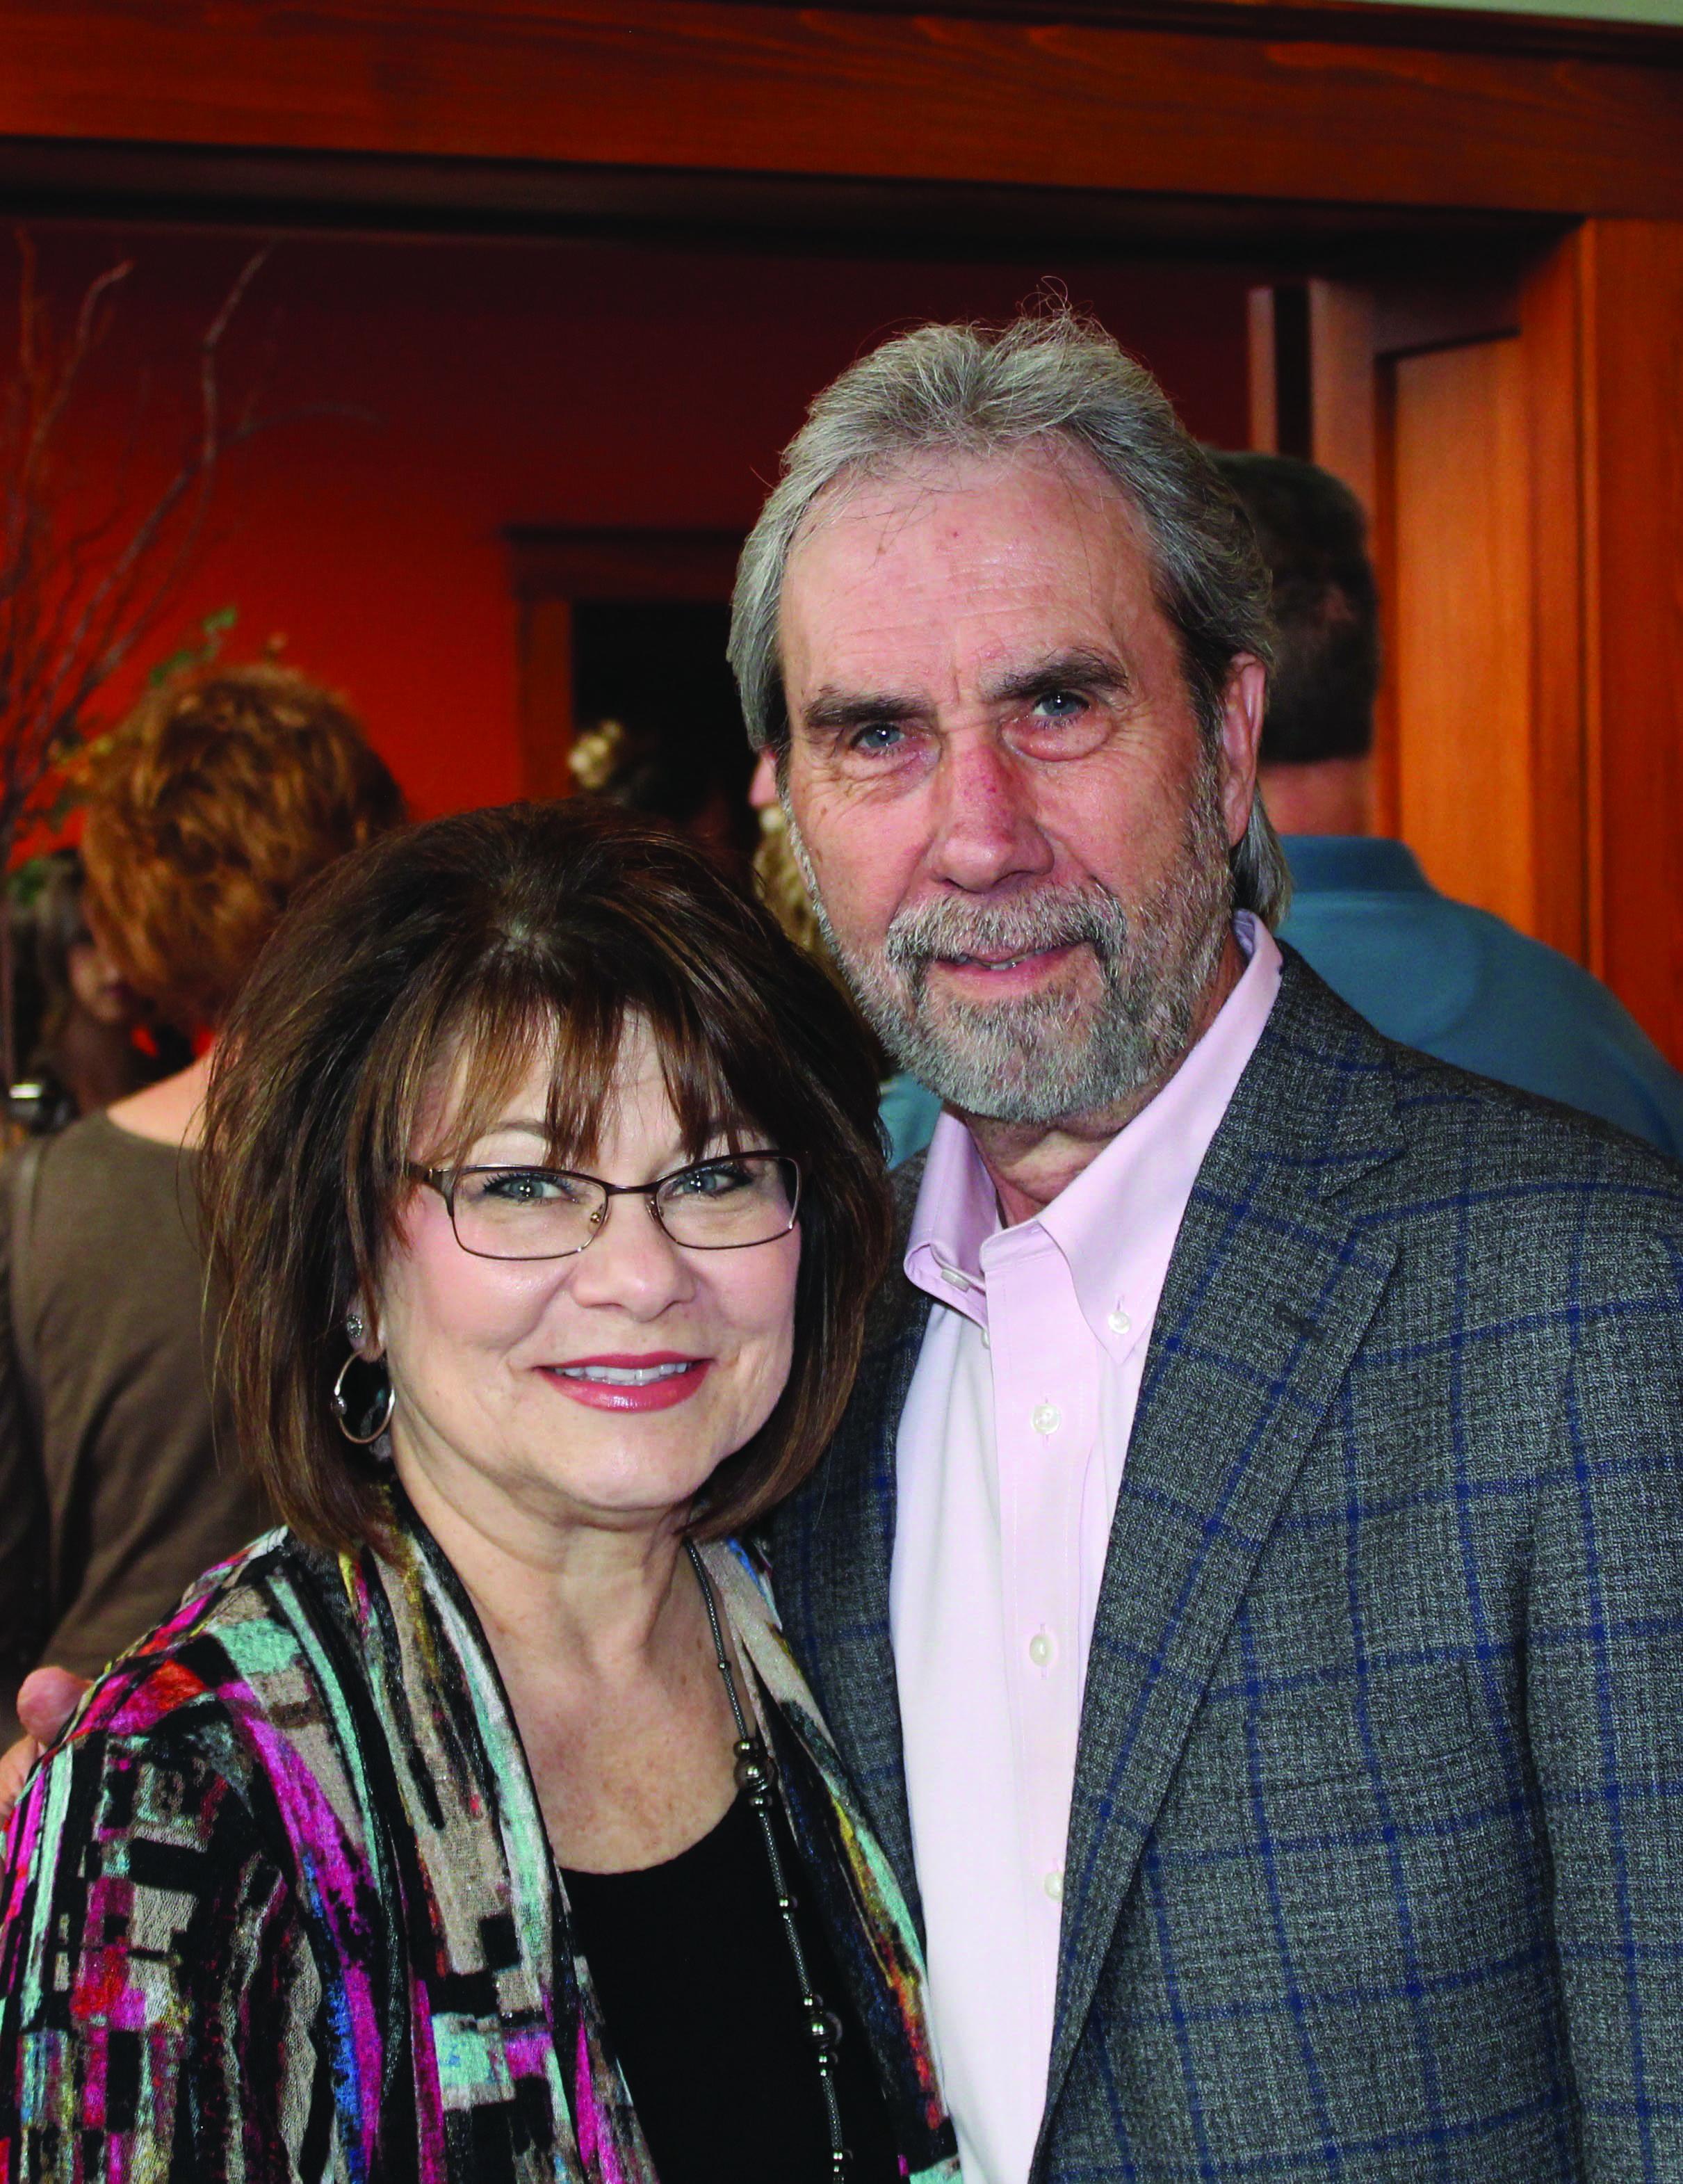 Carla and David Whatley